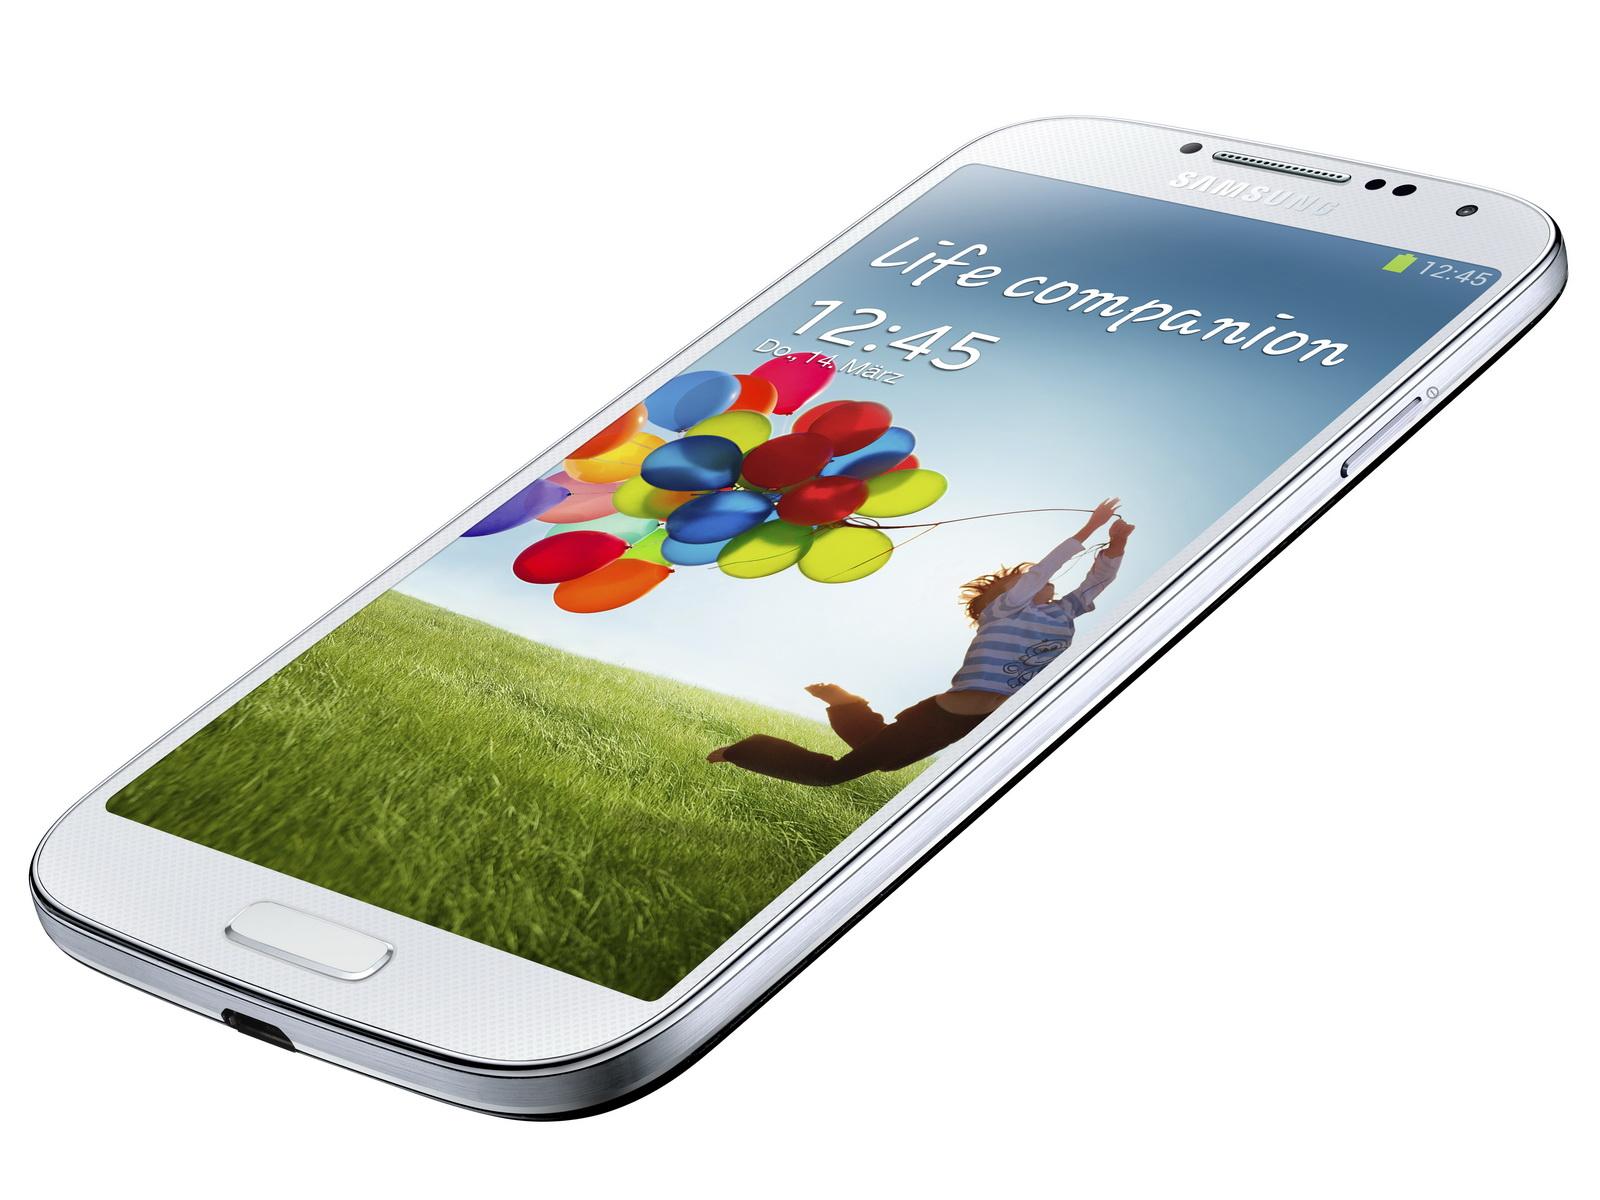 Notebook samsung galaxy s4 - Smartphones O2 Startet Mit Verkauf Des Samsung Galaxy S4 Notebookcheck Com News